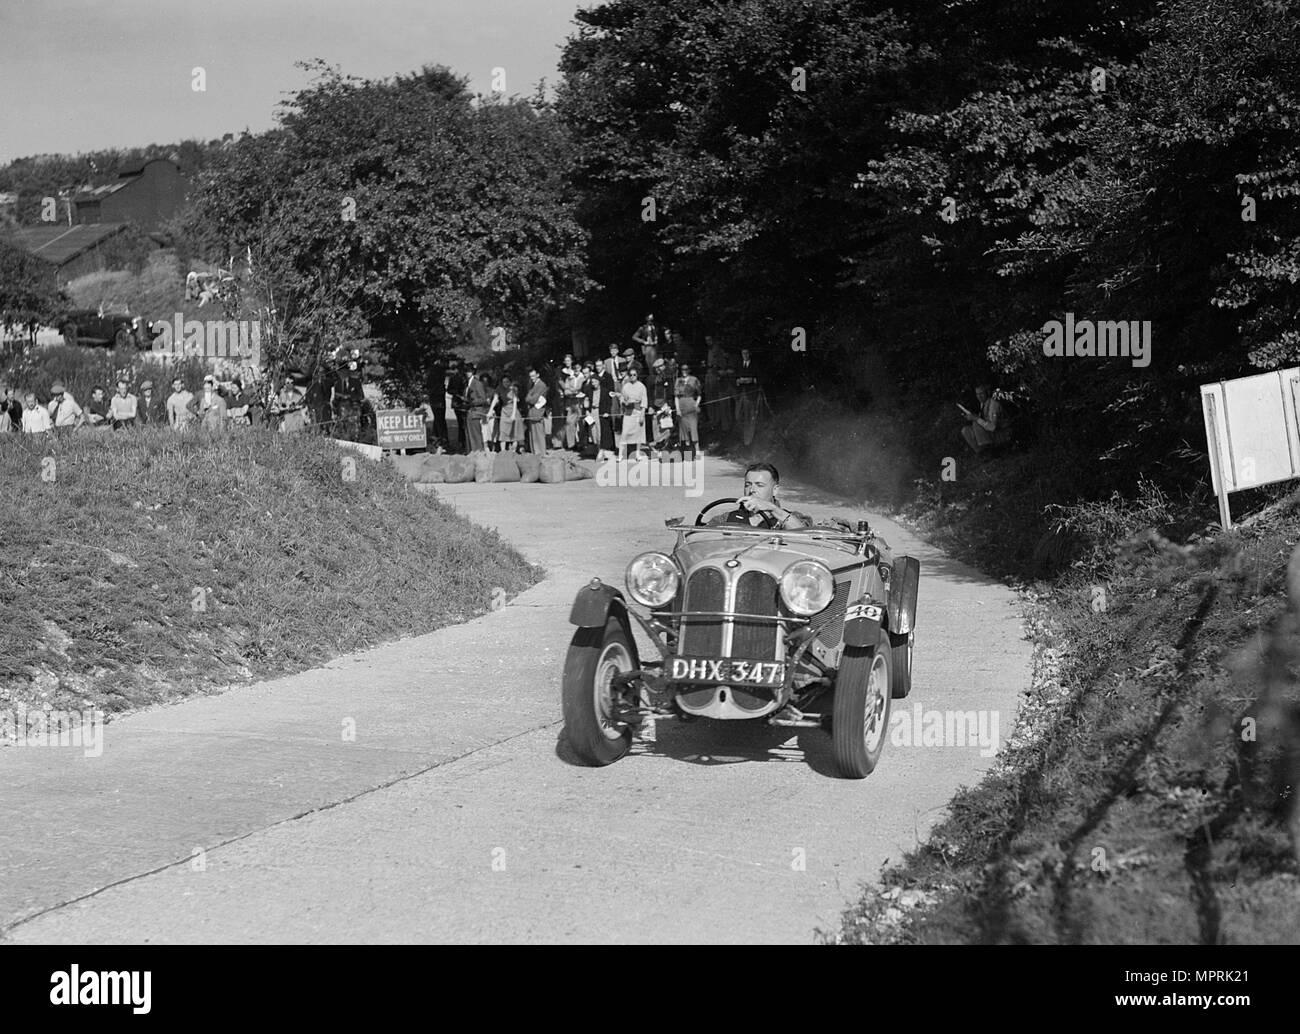 Frazer-Nash BMW 319/55 of CG Fitt competing in the VSCC Croydon Speed Trials, 1937. Artist: Bill Brunell. - Stock Image